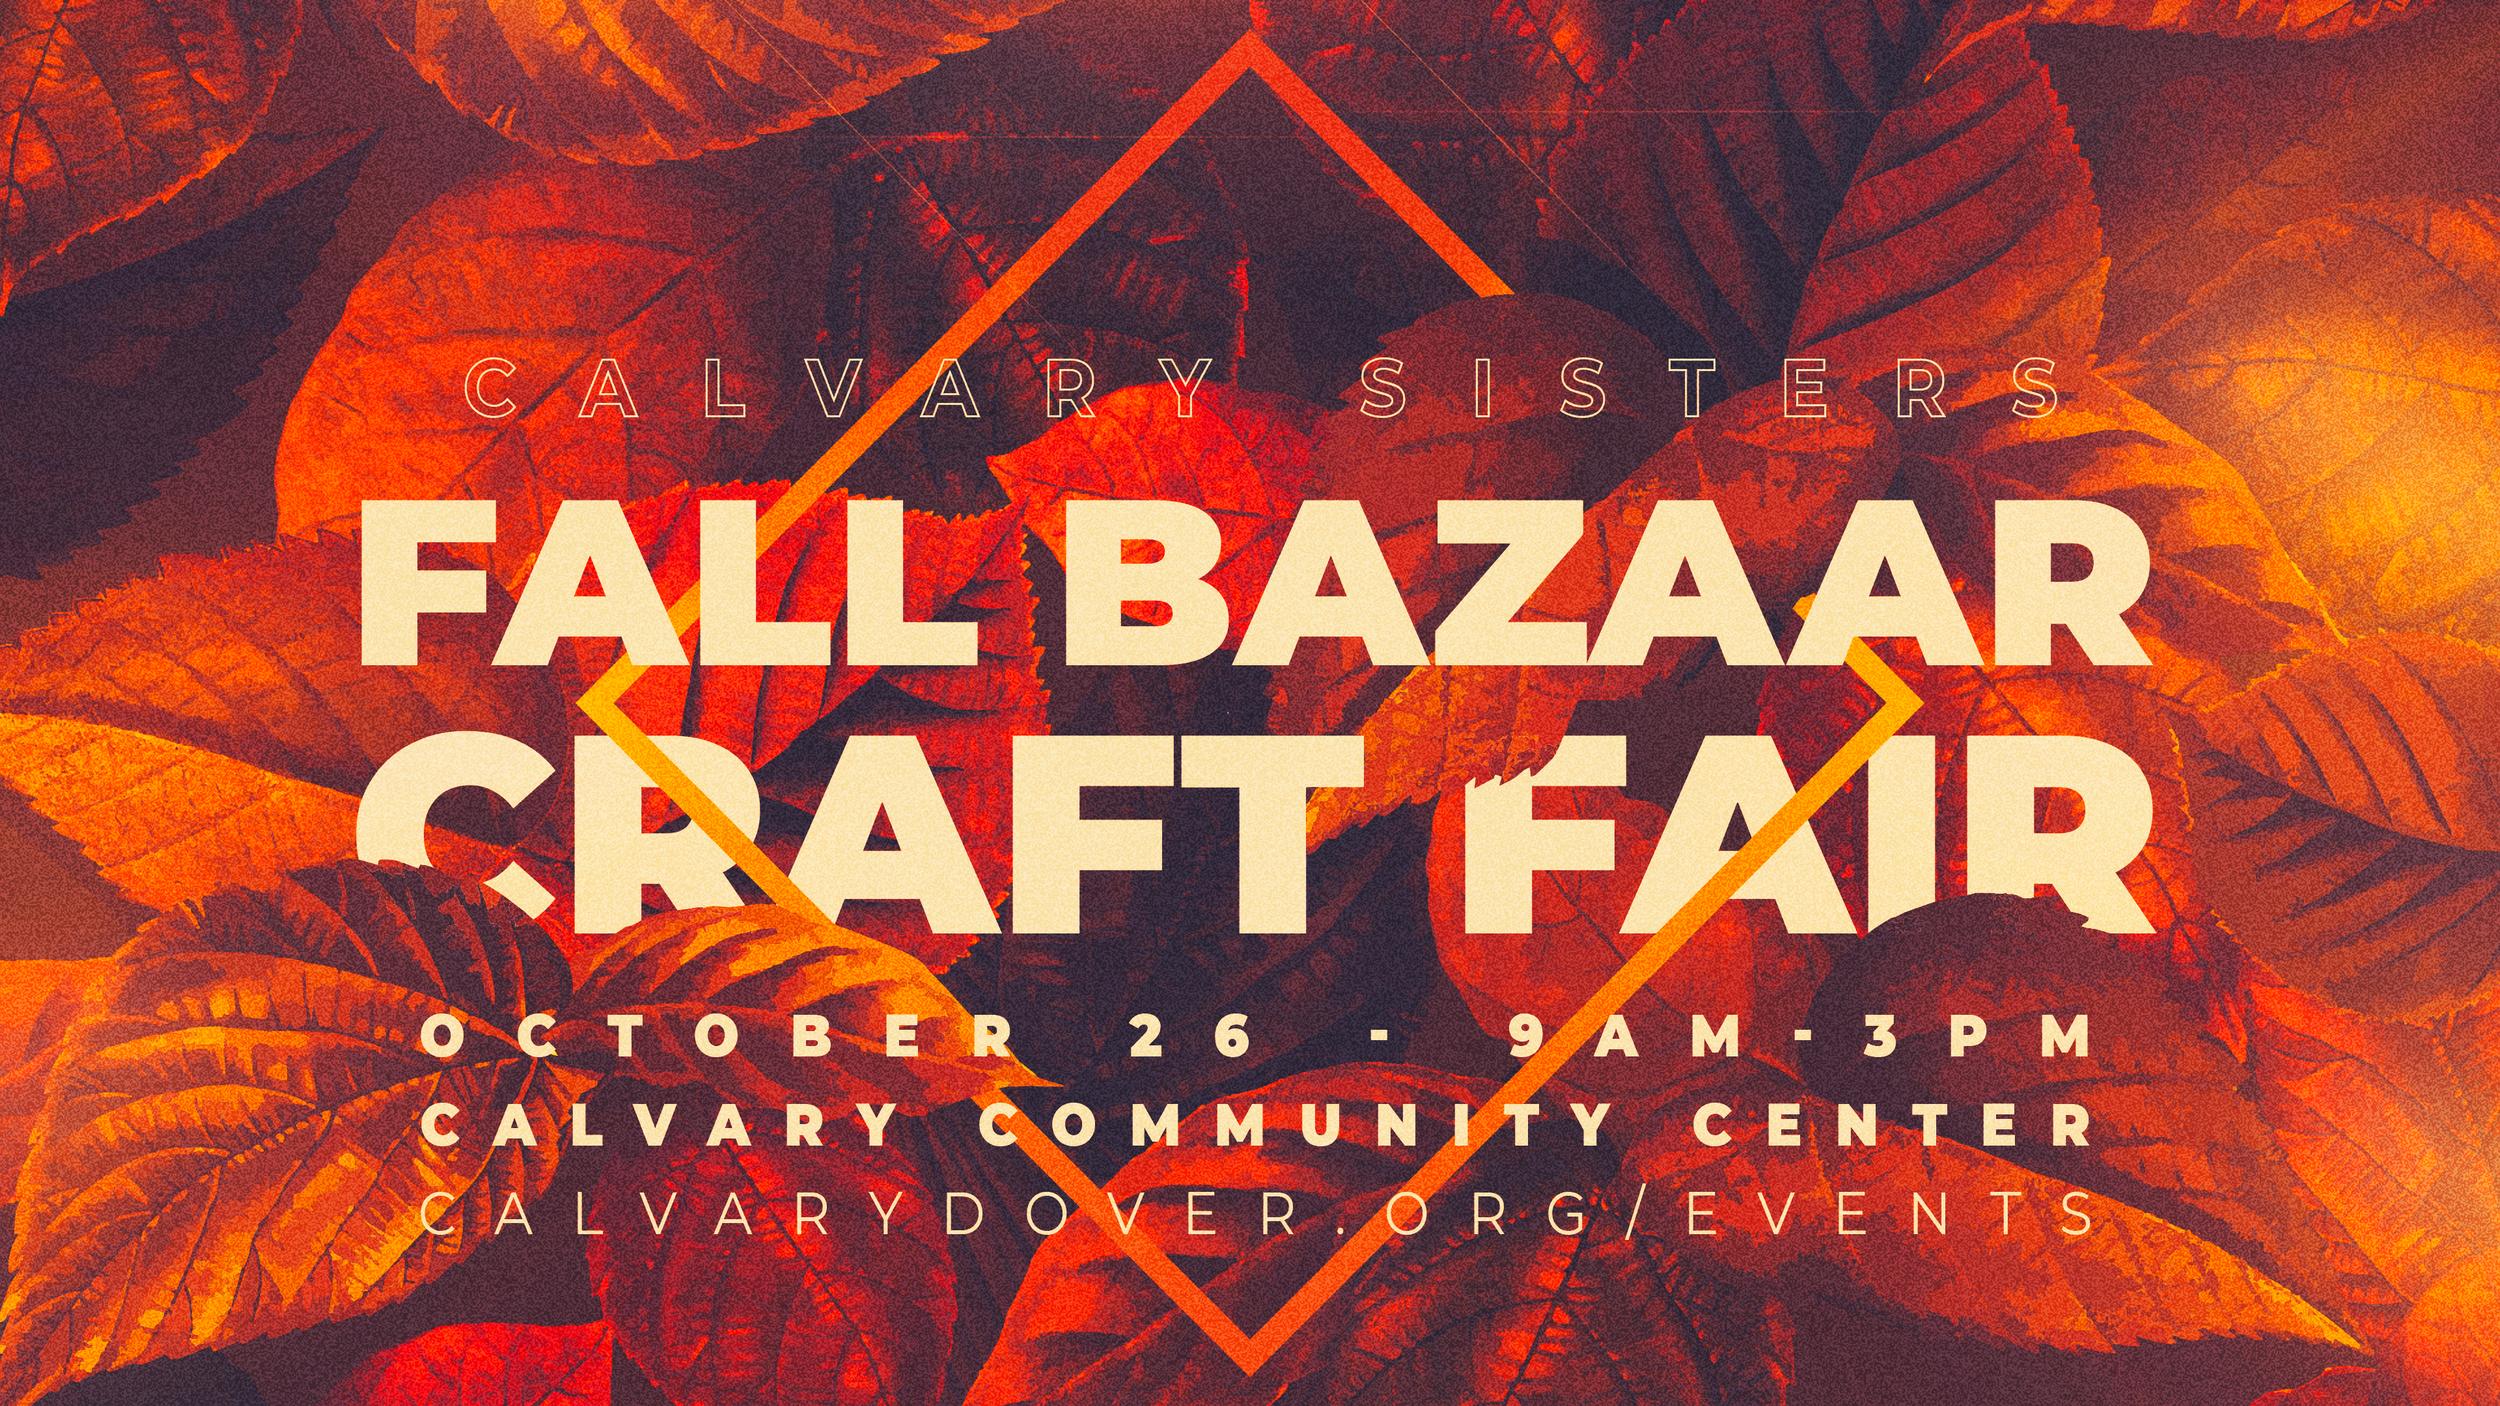 FALL BAZAAR AND CRAFT FAIR October 26, 9am - 3pm Calvary Community Center, 1532 E Lebanon Road, Dover